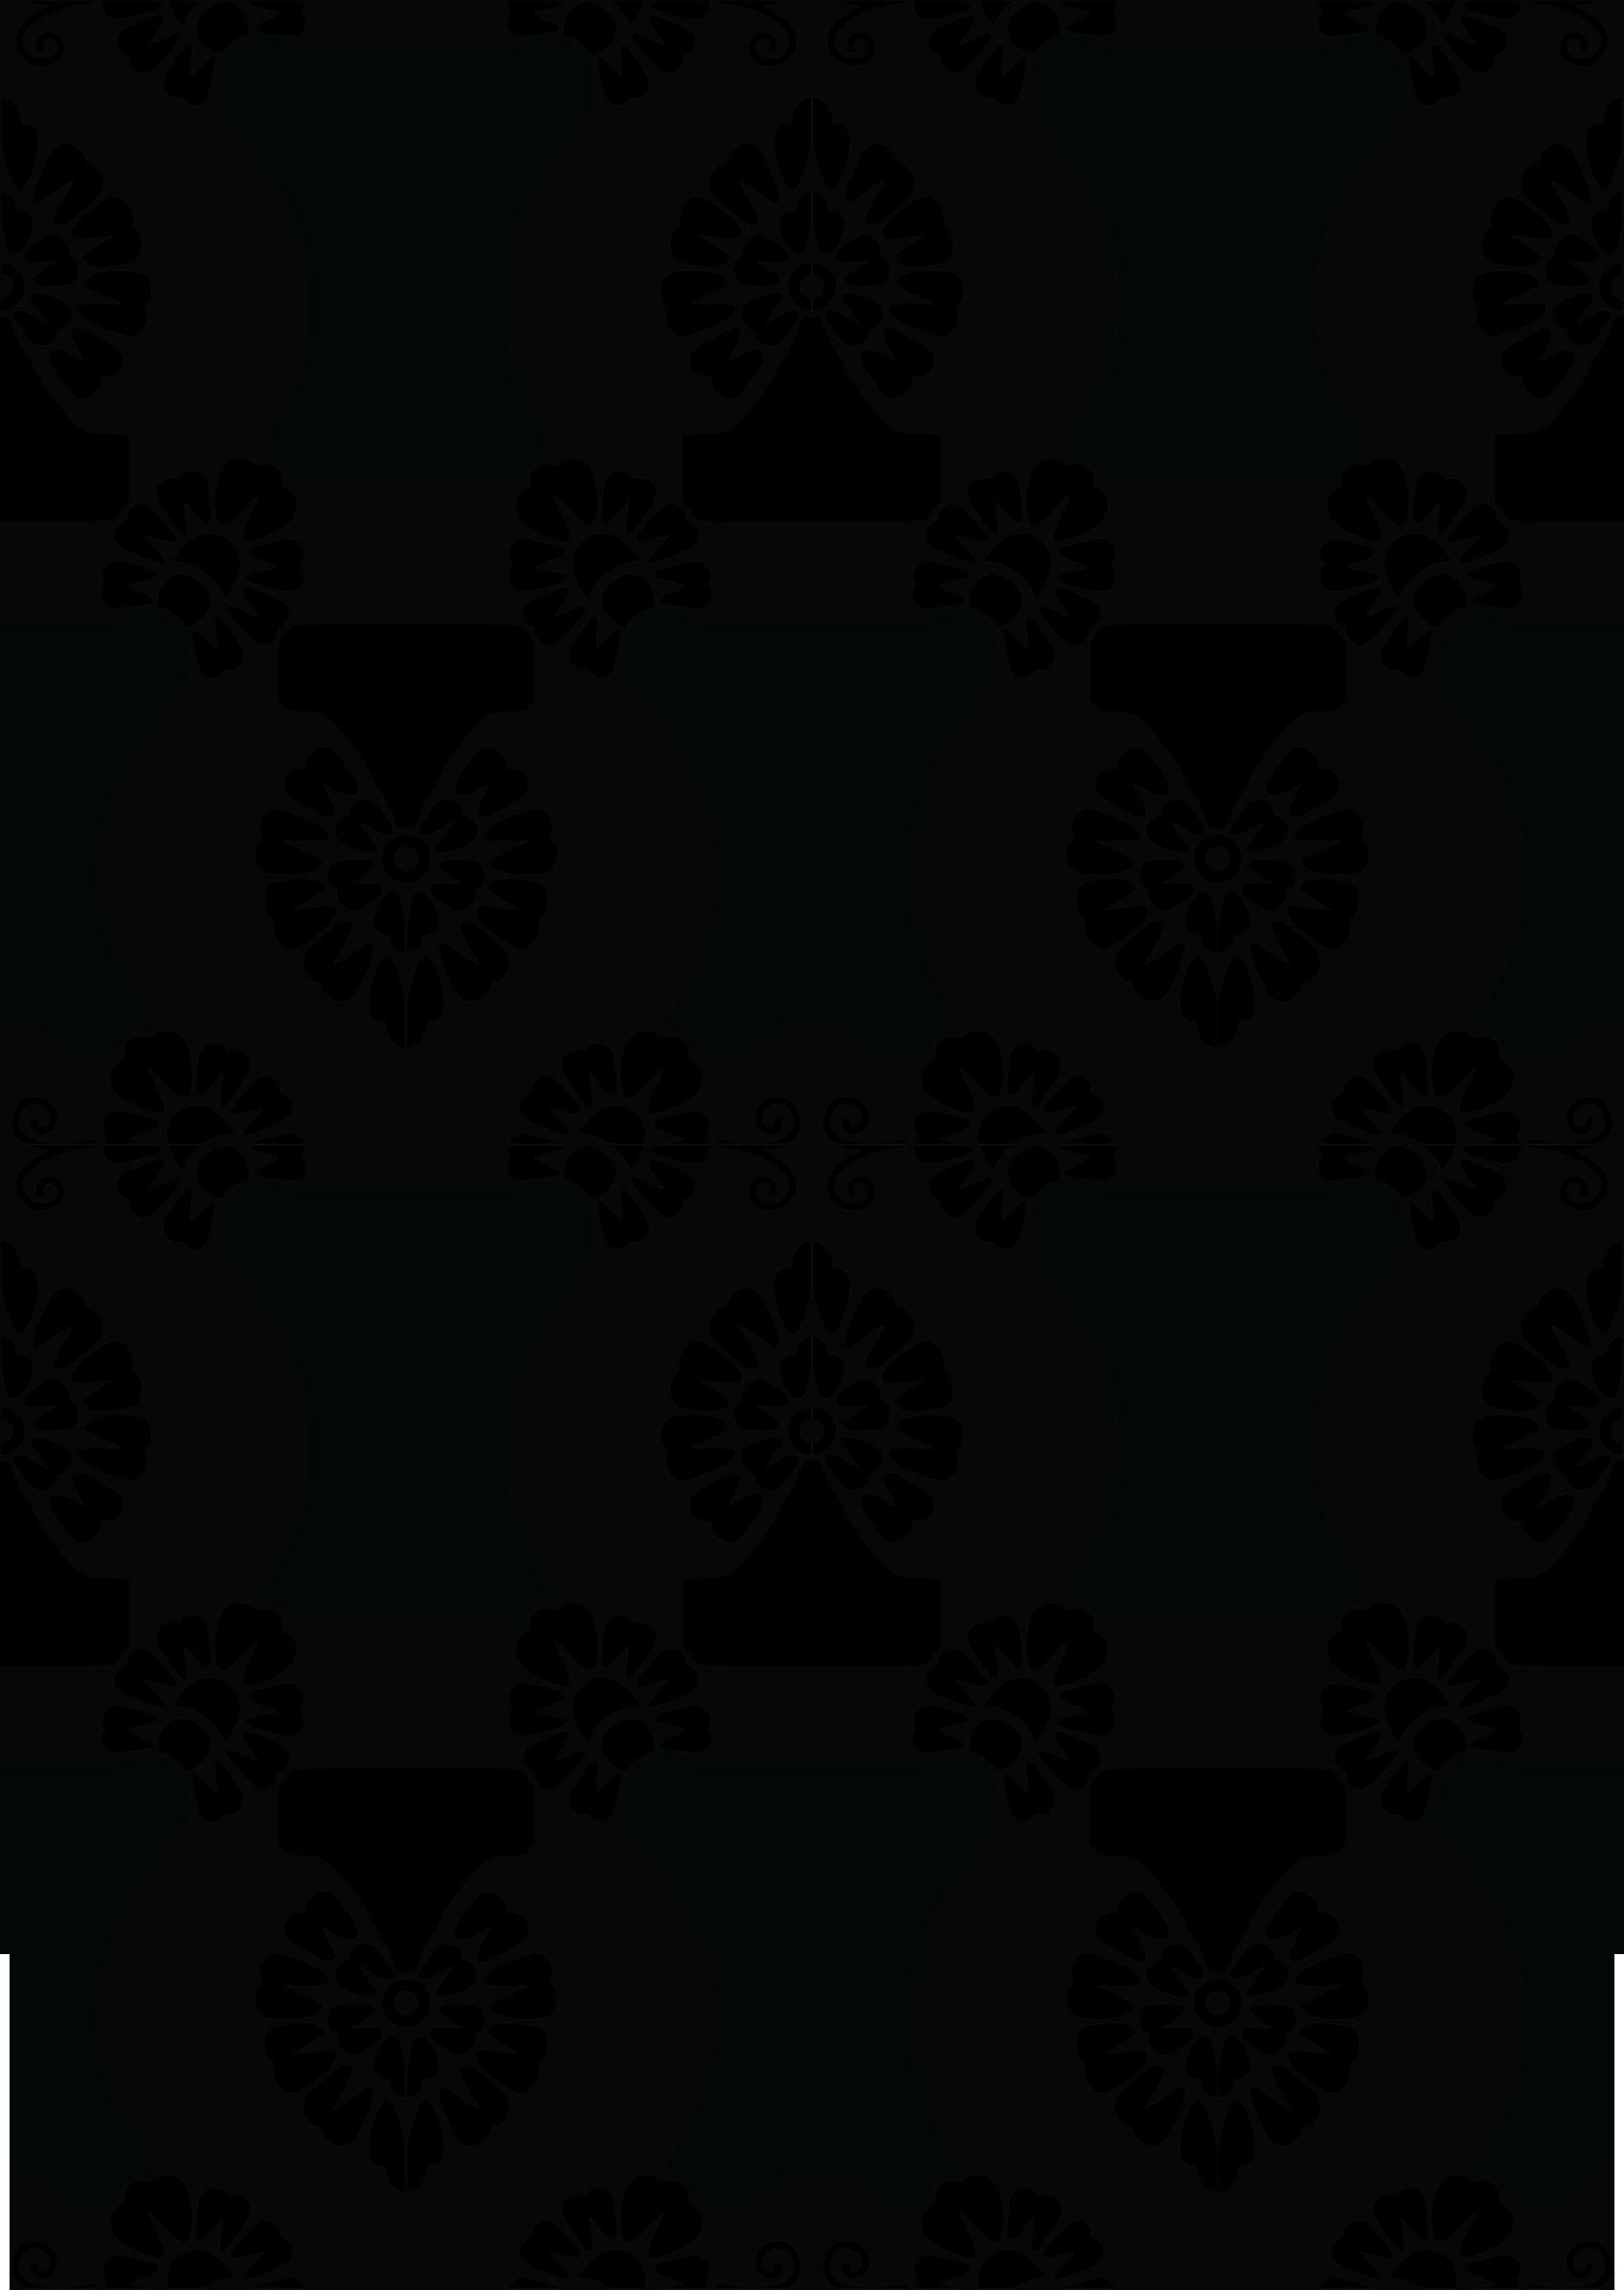 heart flower, floral vector background | Border embroidery designs, Floral  pattern vector, Floral border